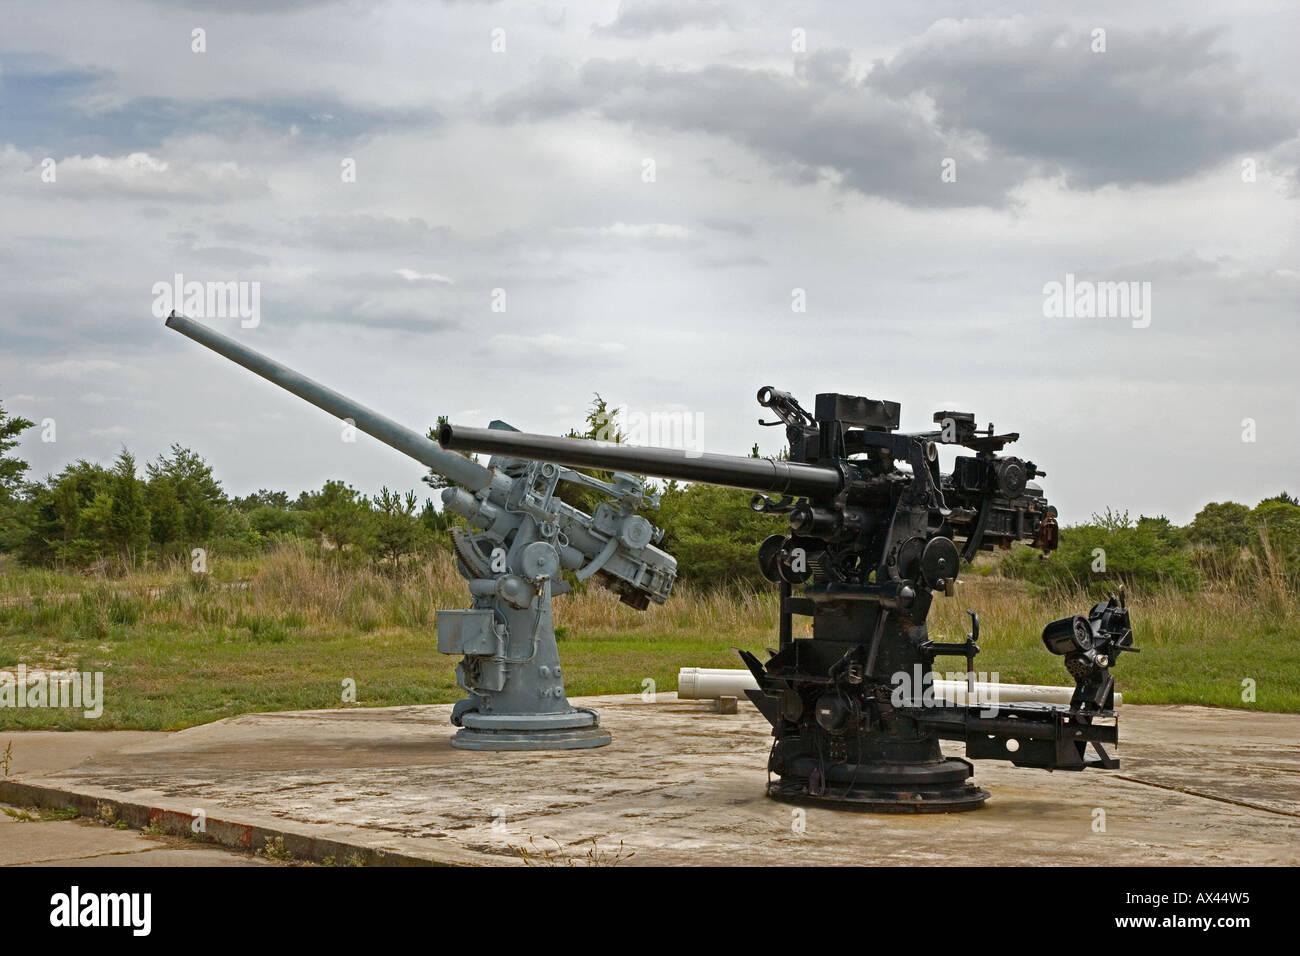 'World War II Artillary' - Stock Image